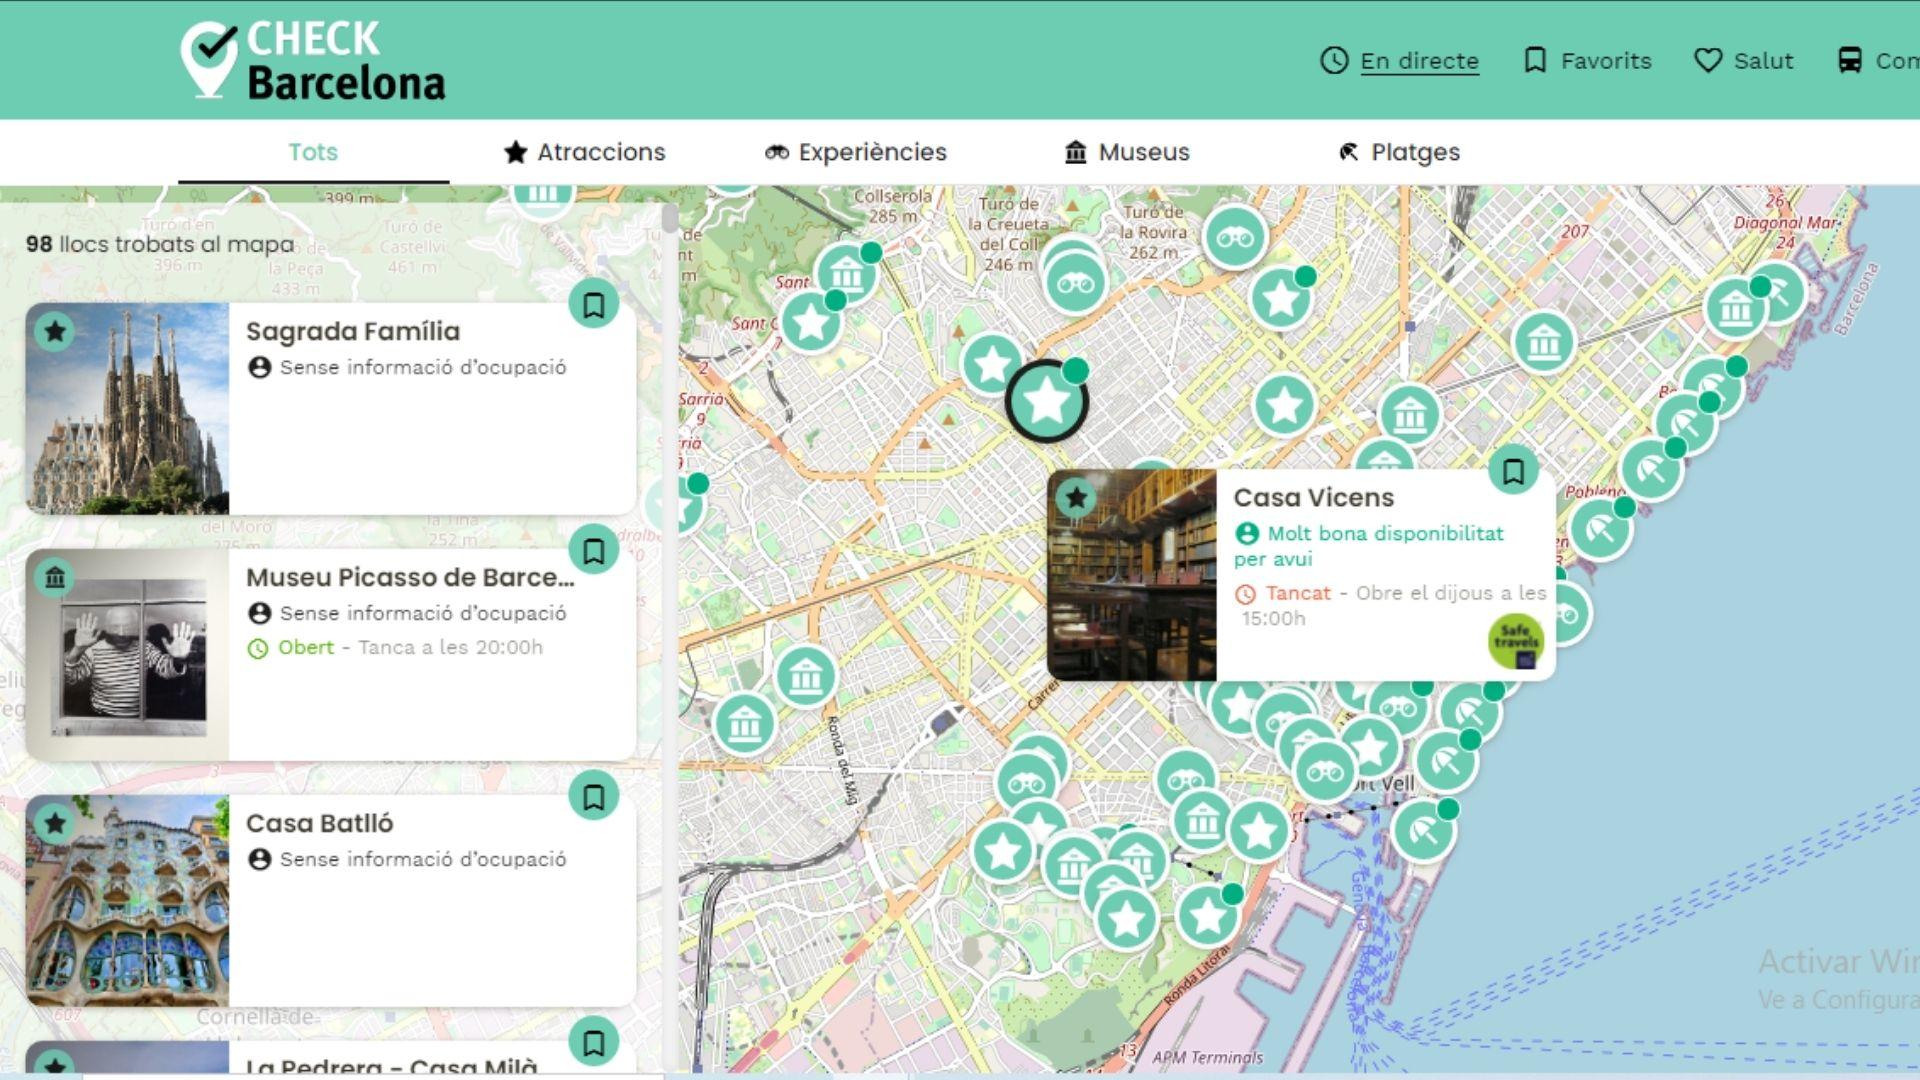 Mapa de l'app Check Barcelona